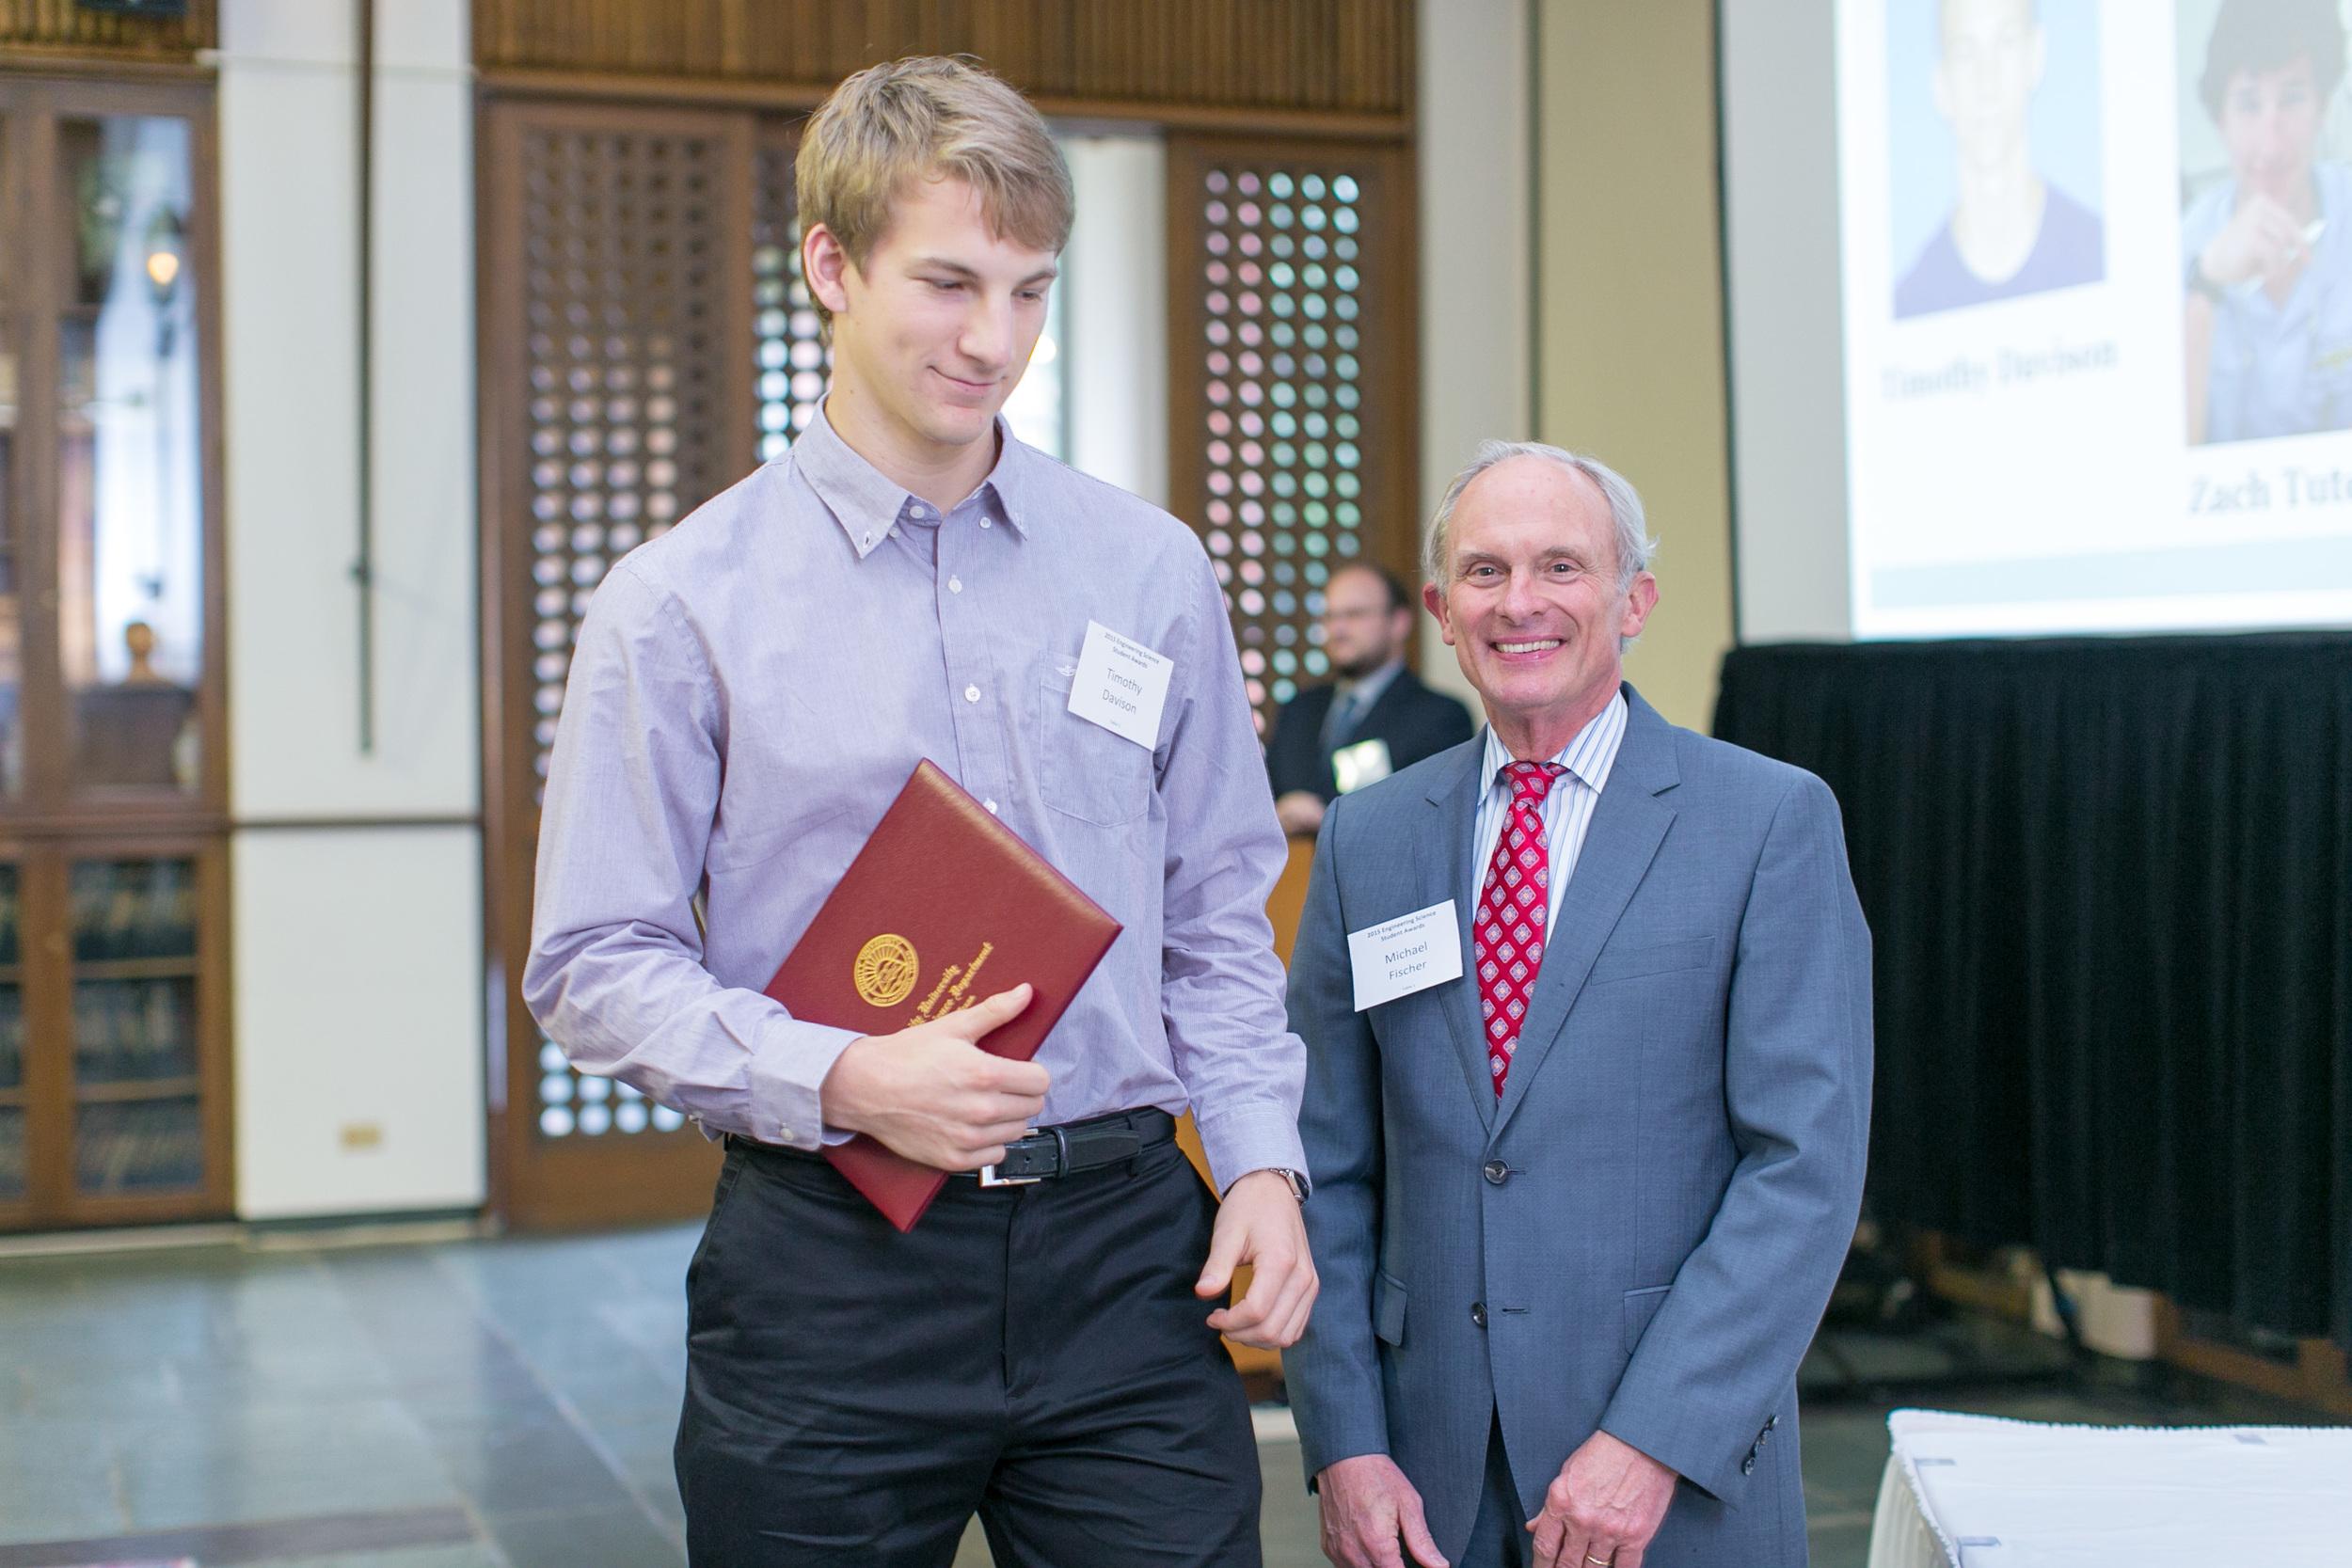 086-Engineering Awards.jpg